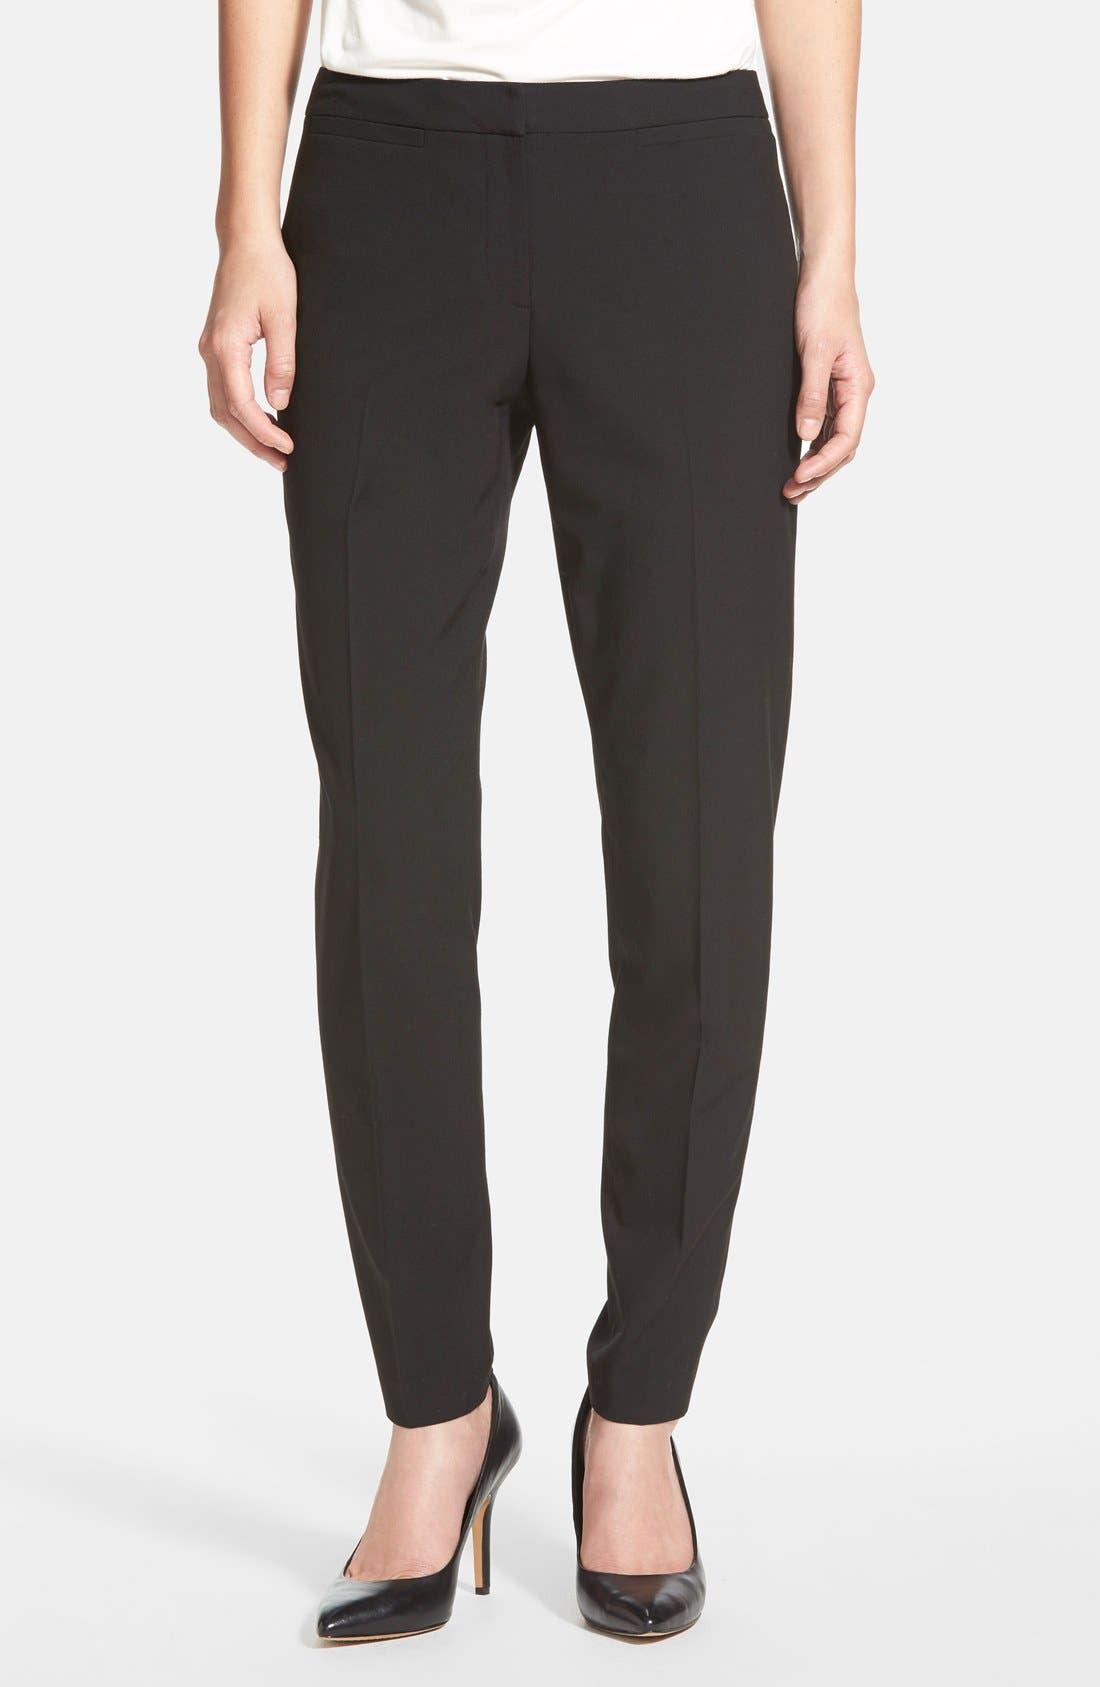 Alternate Image 1 Selected - Halogen® 'Taylor' Ankle Skinny Pants (Regular & Petite)